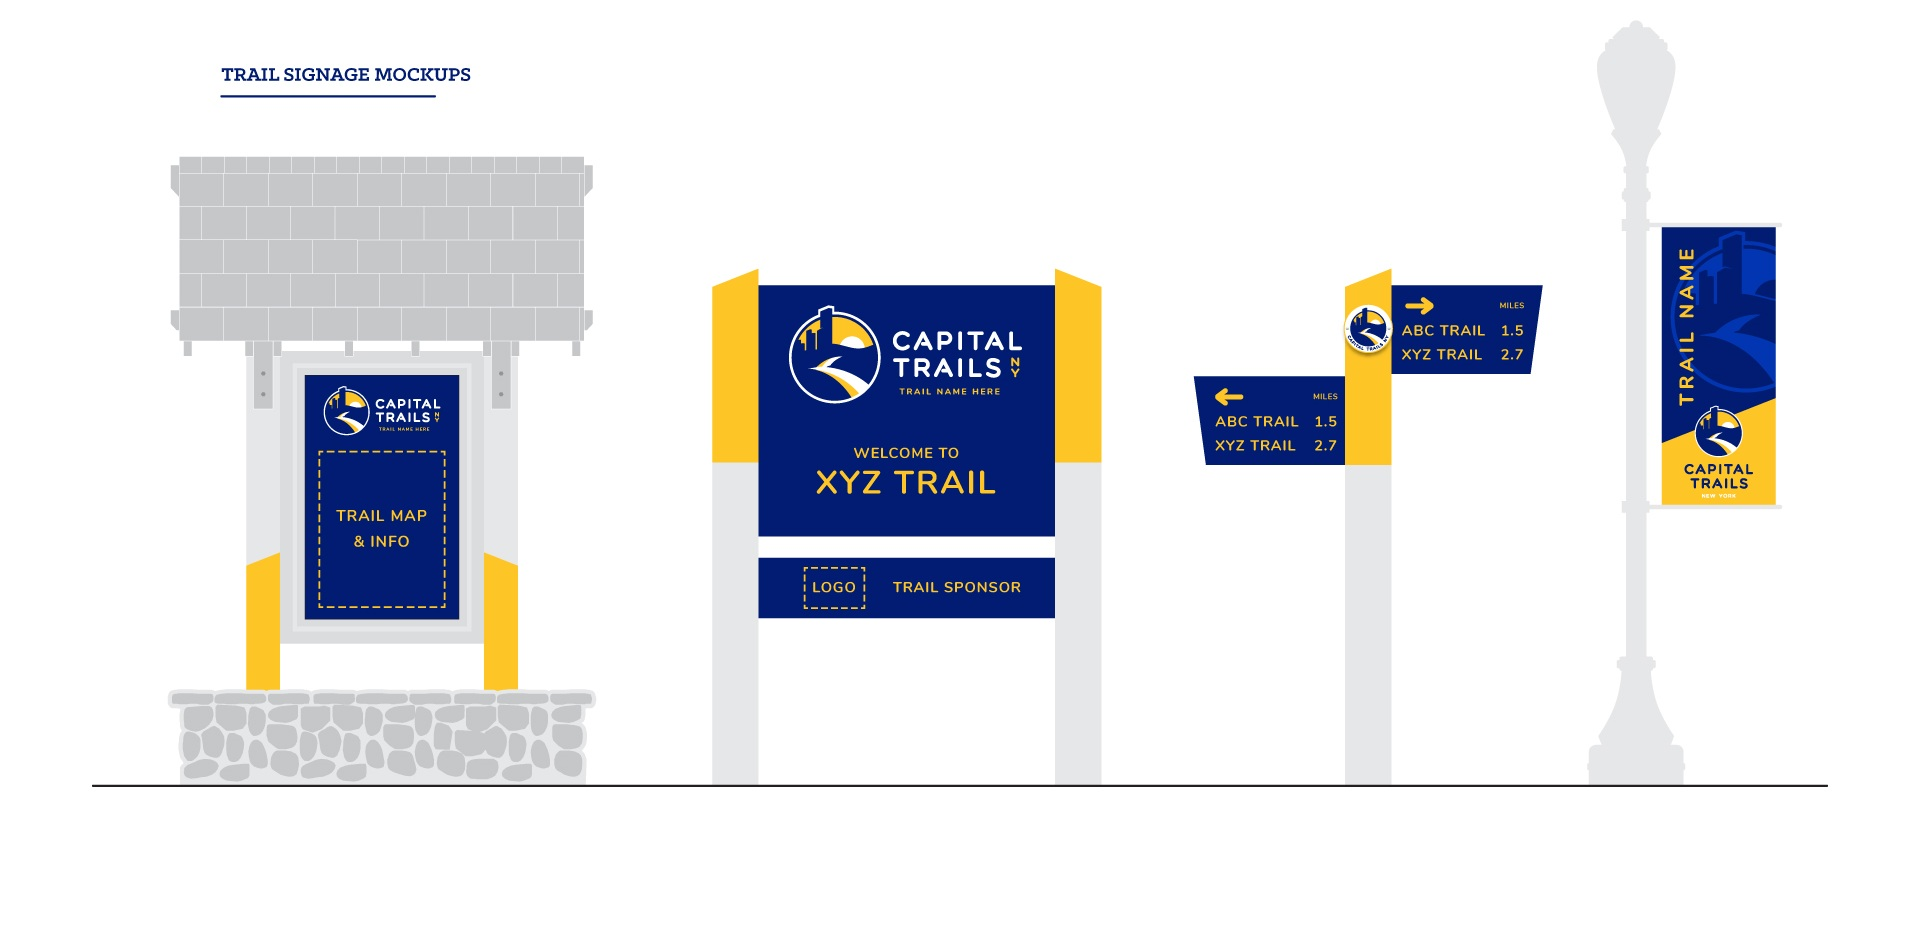 CapitalTrails_Signage_v1.jpg